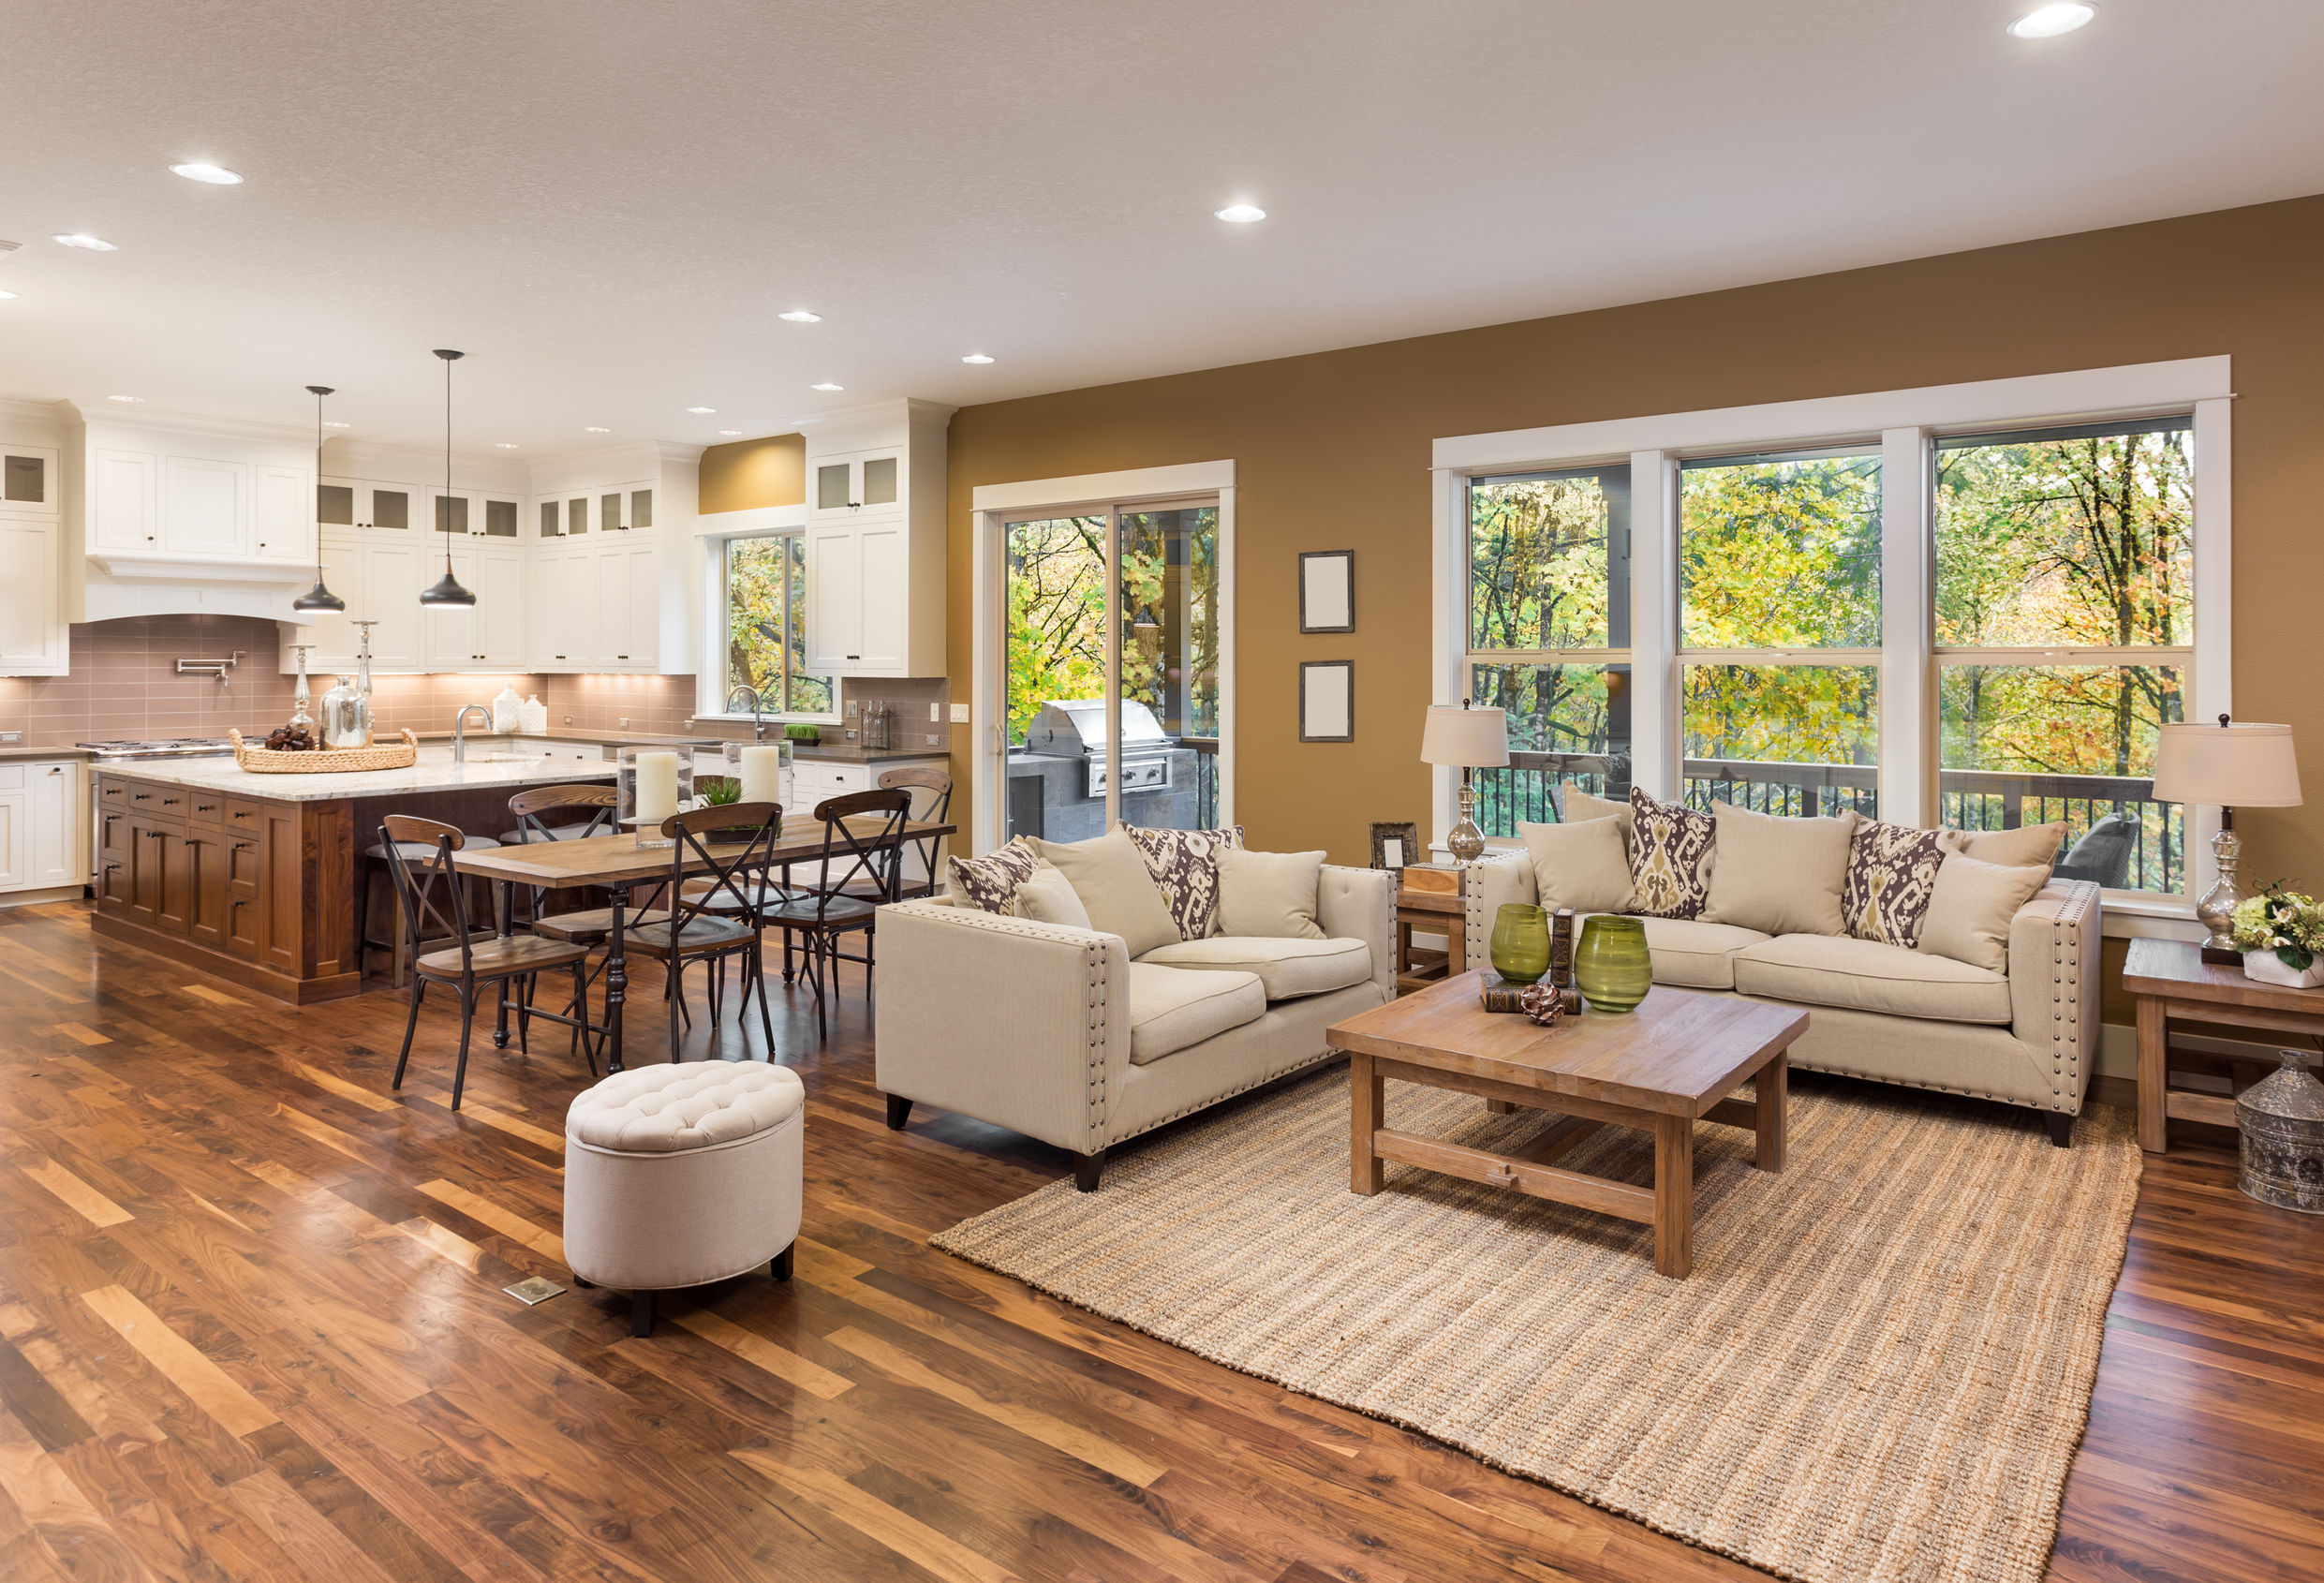 Example of Traditional Solid Wood/Hardwood Flooring